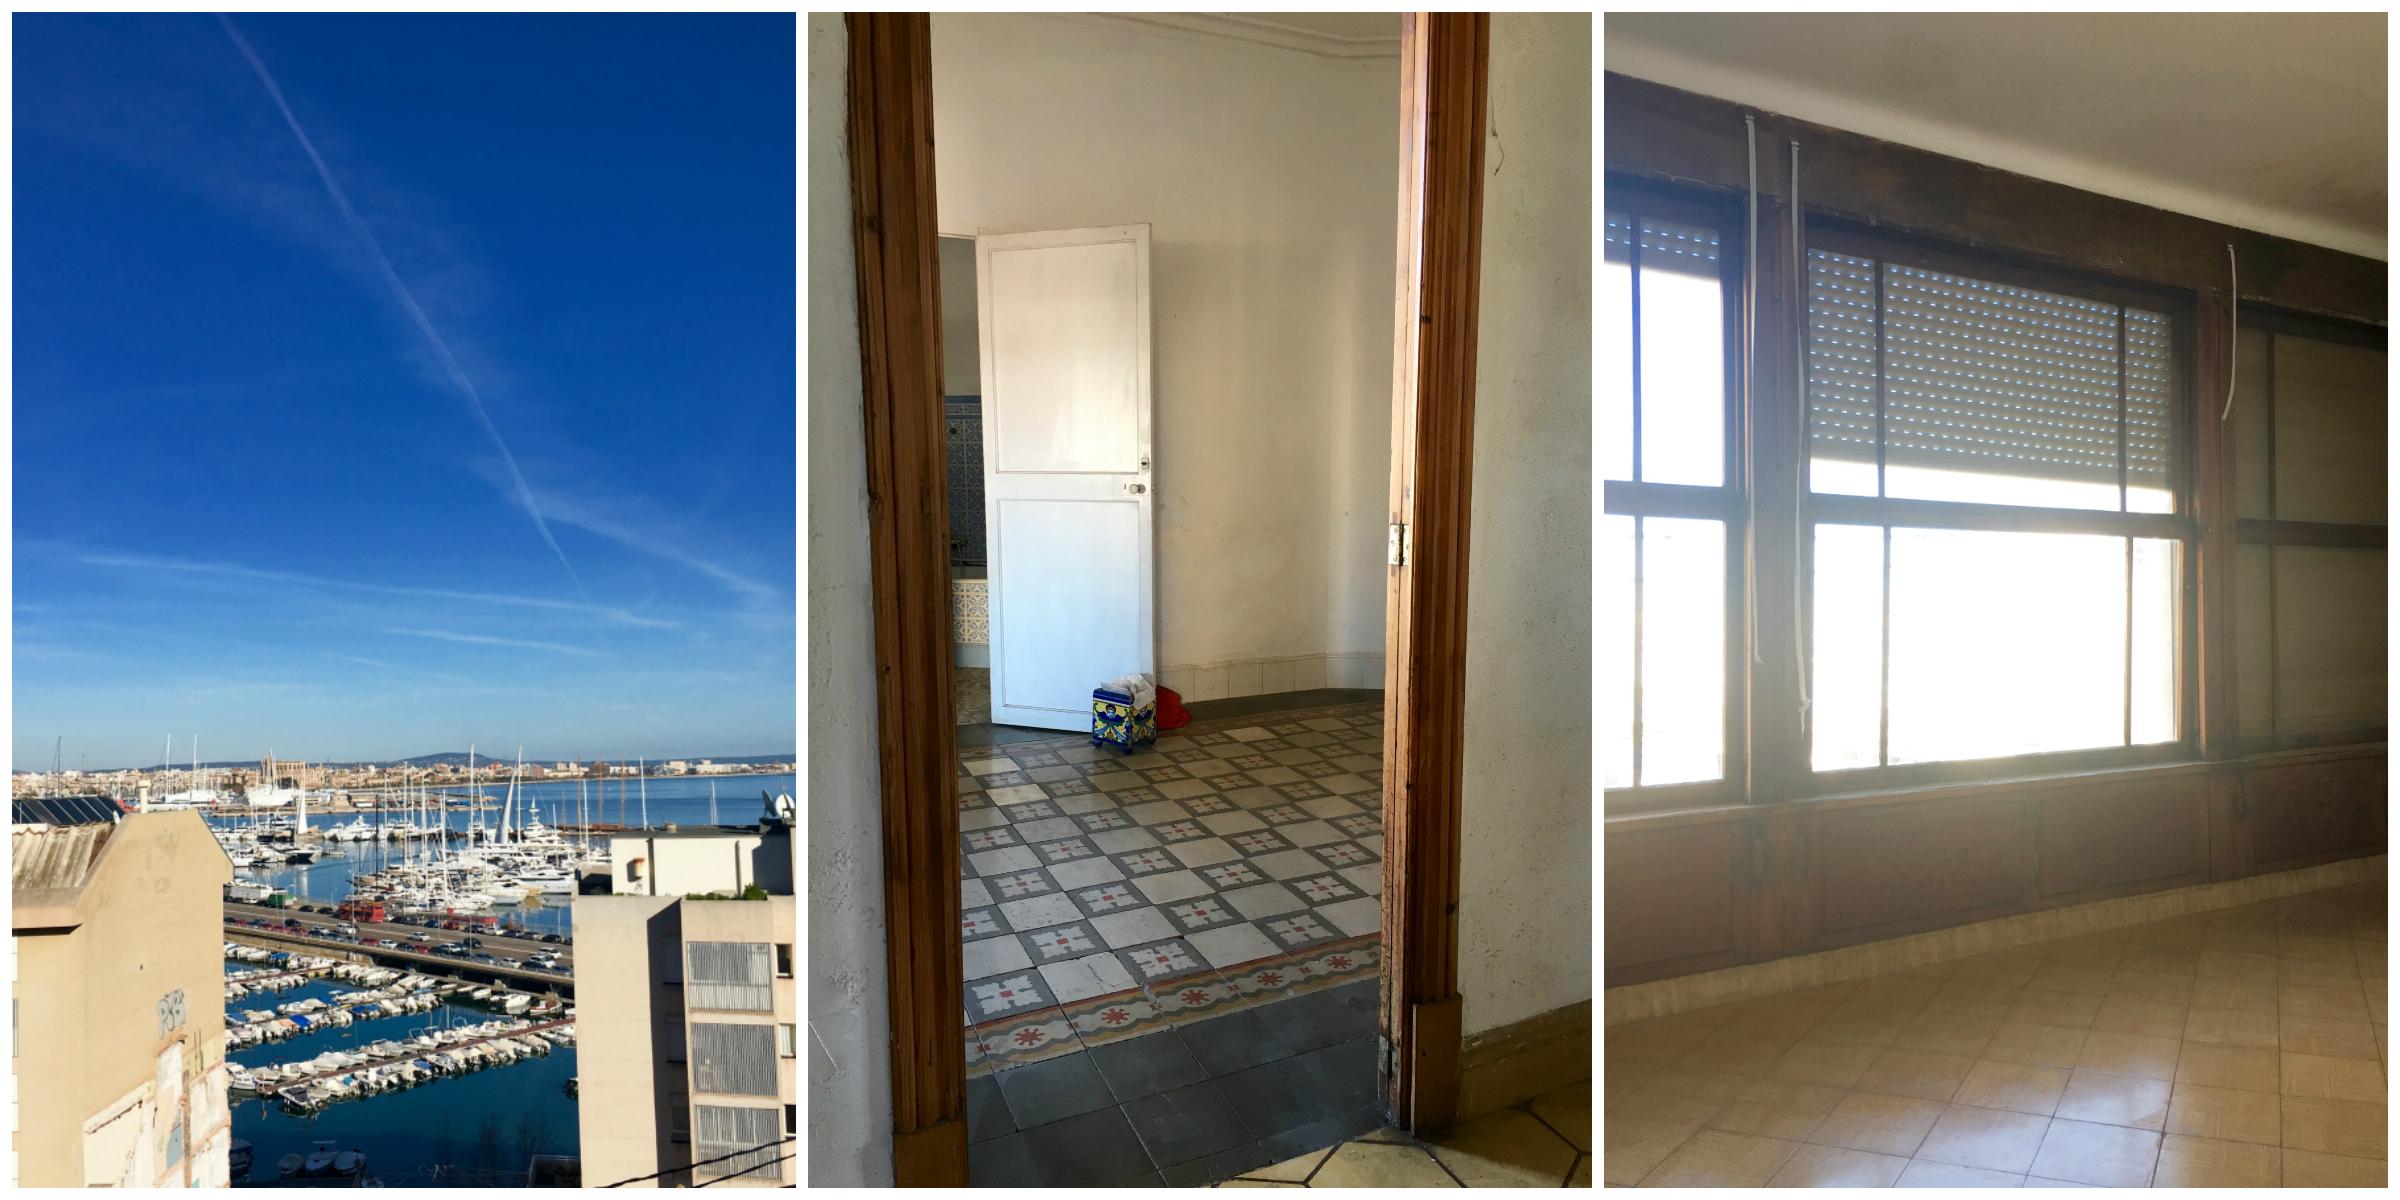 Lägenhetsrenovering på Mallorca - Sanna Fischer - Metro Mode 77a3d895671d7